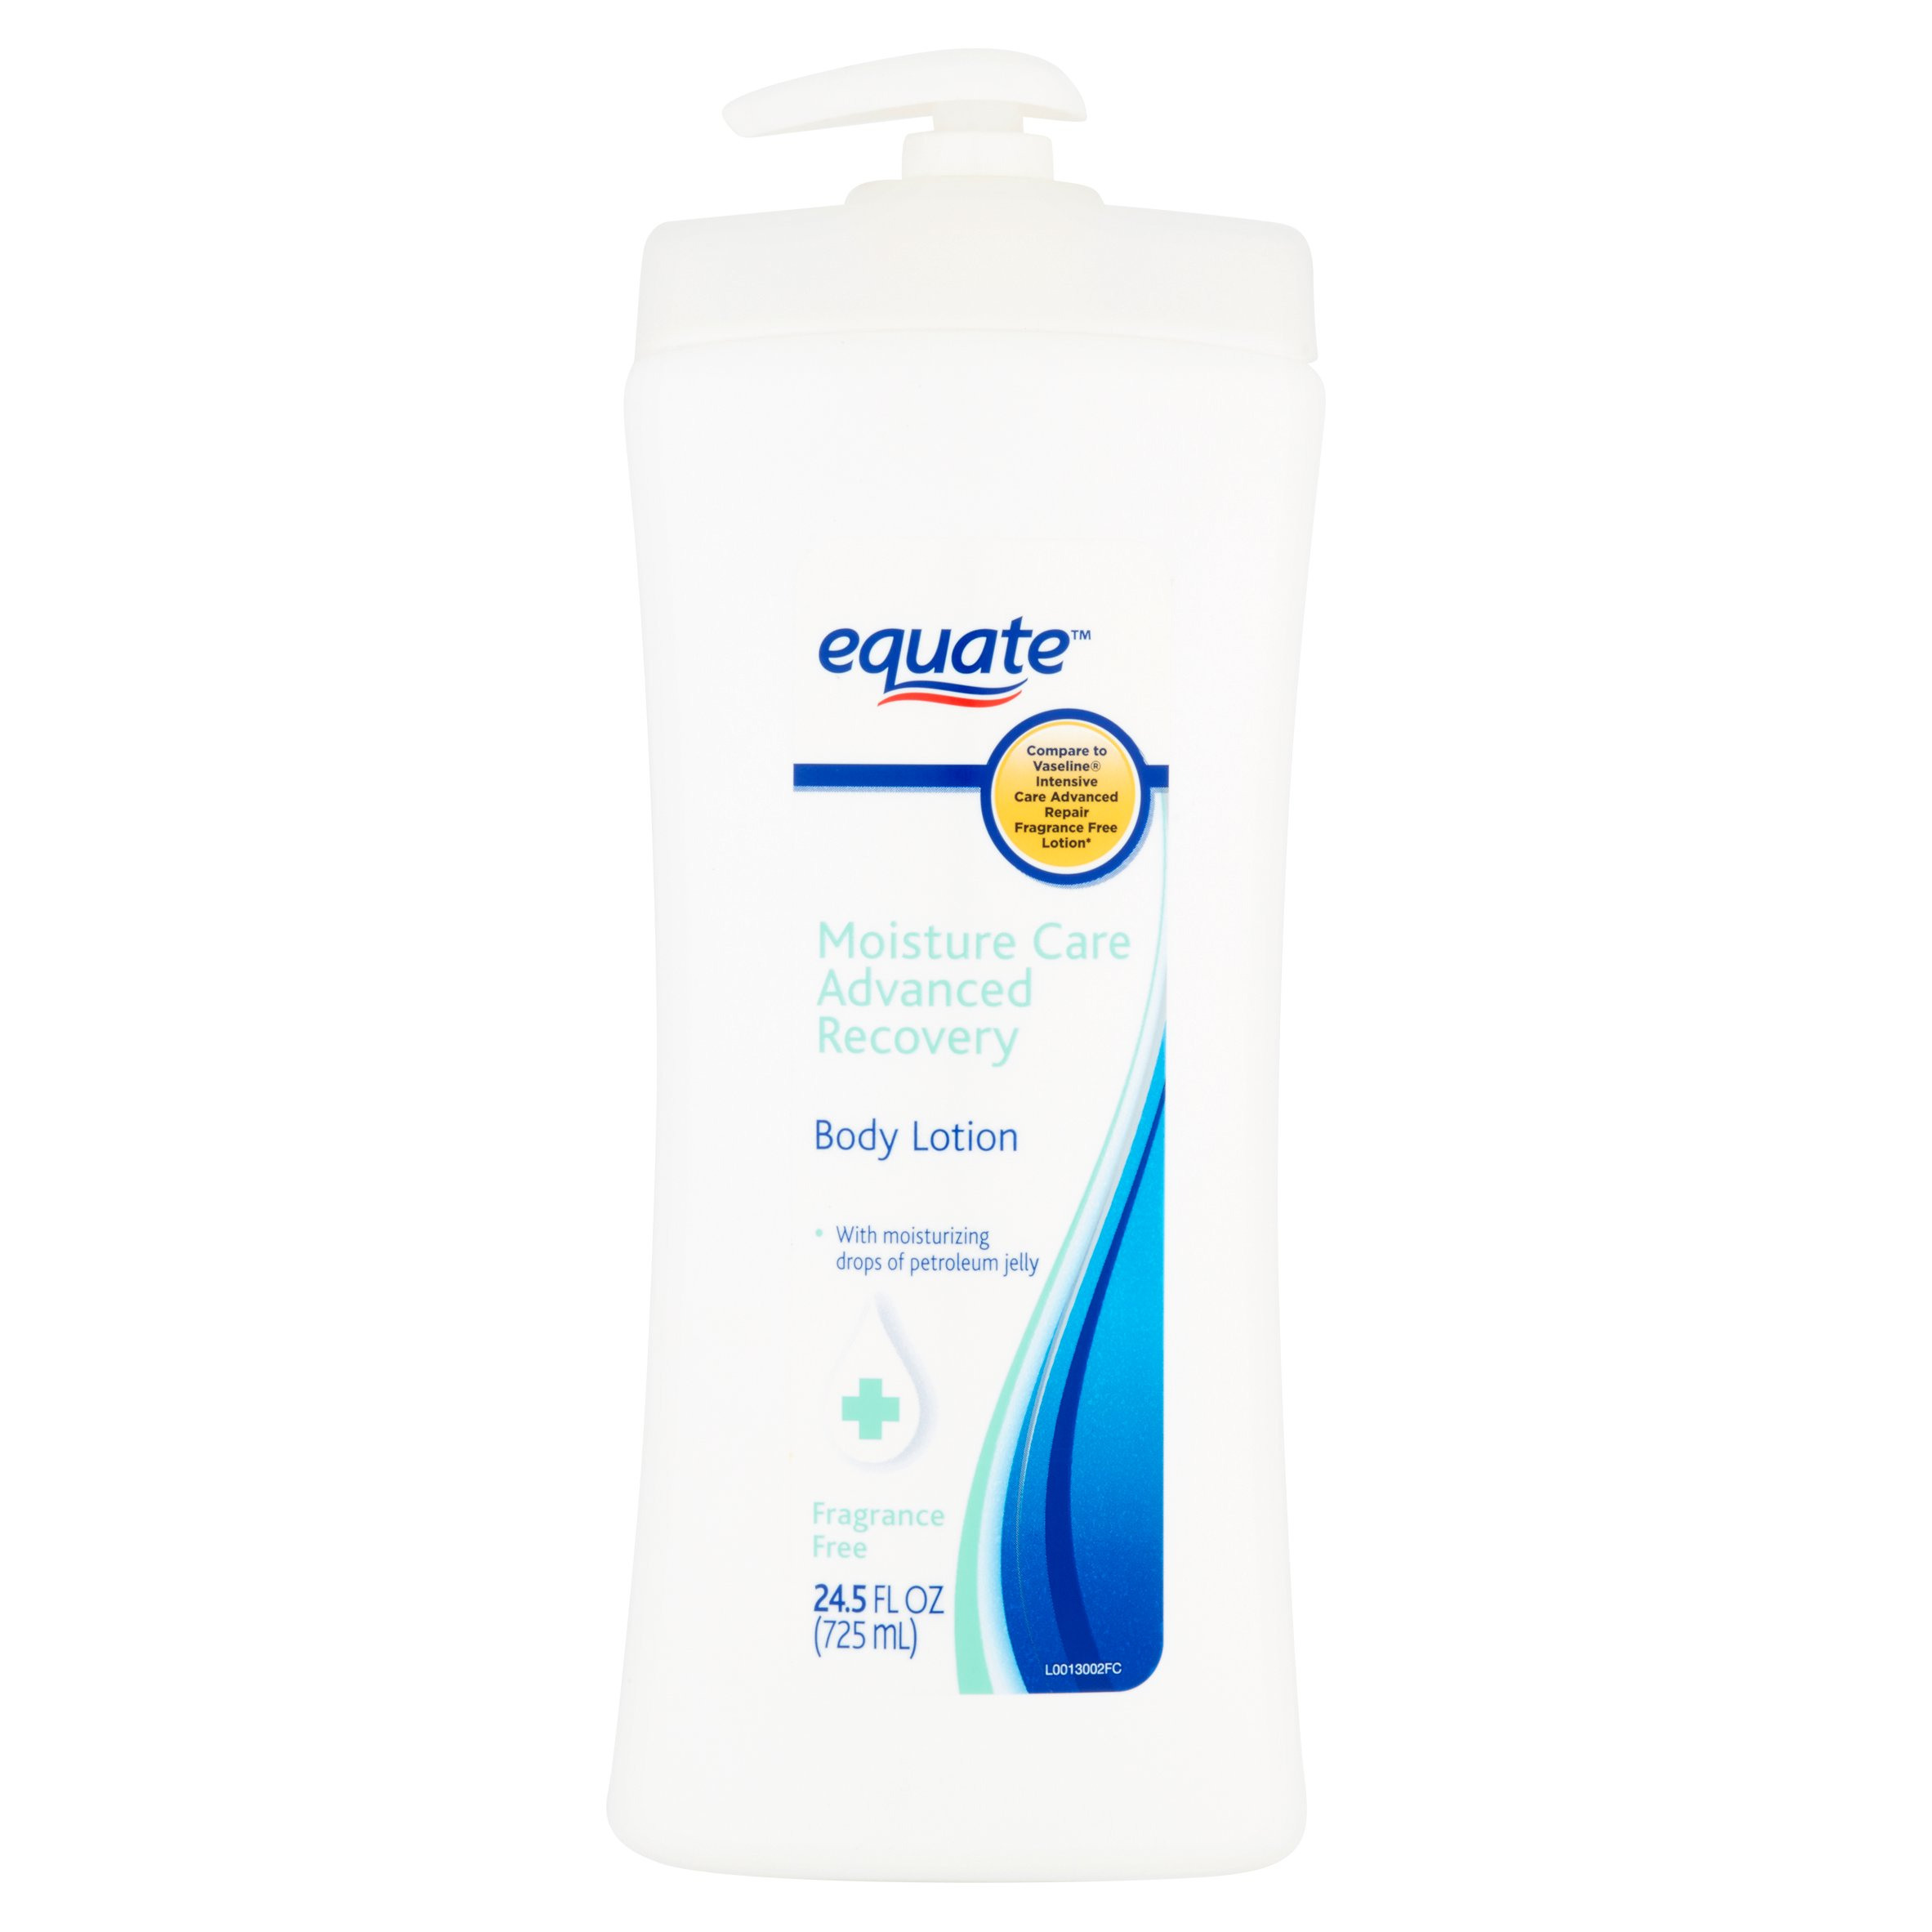 Equate Advanced Recovery Skin Care Lotion, 24.5 fl oz - Walmart.com